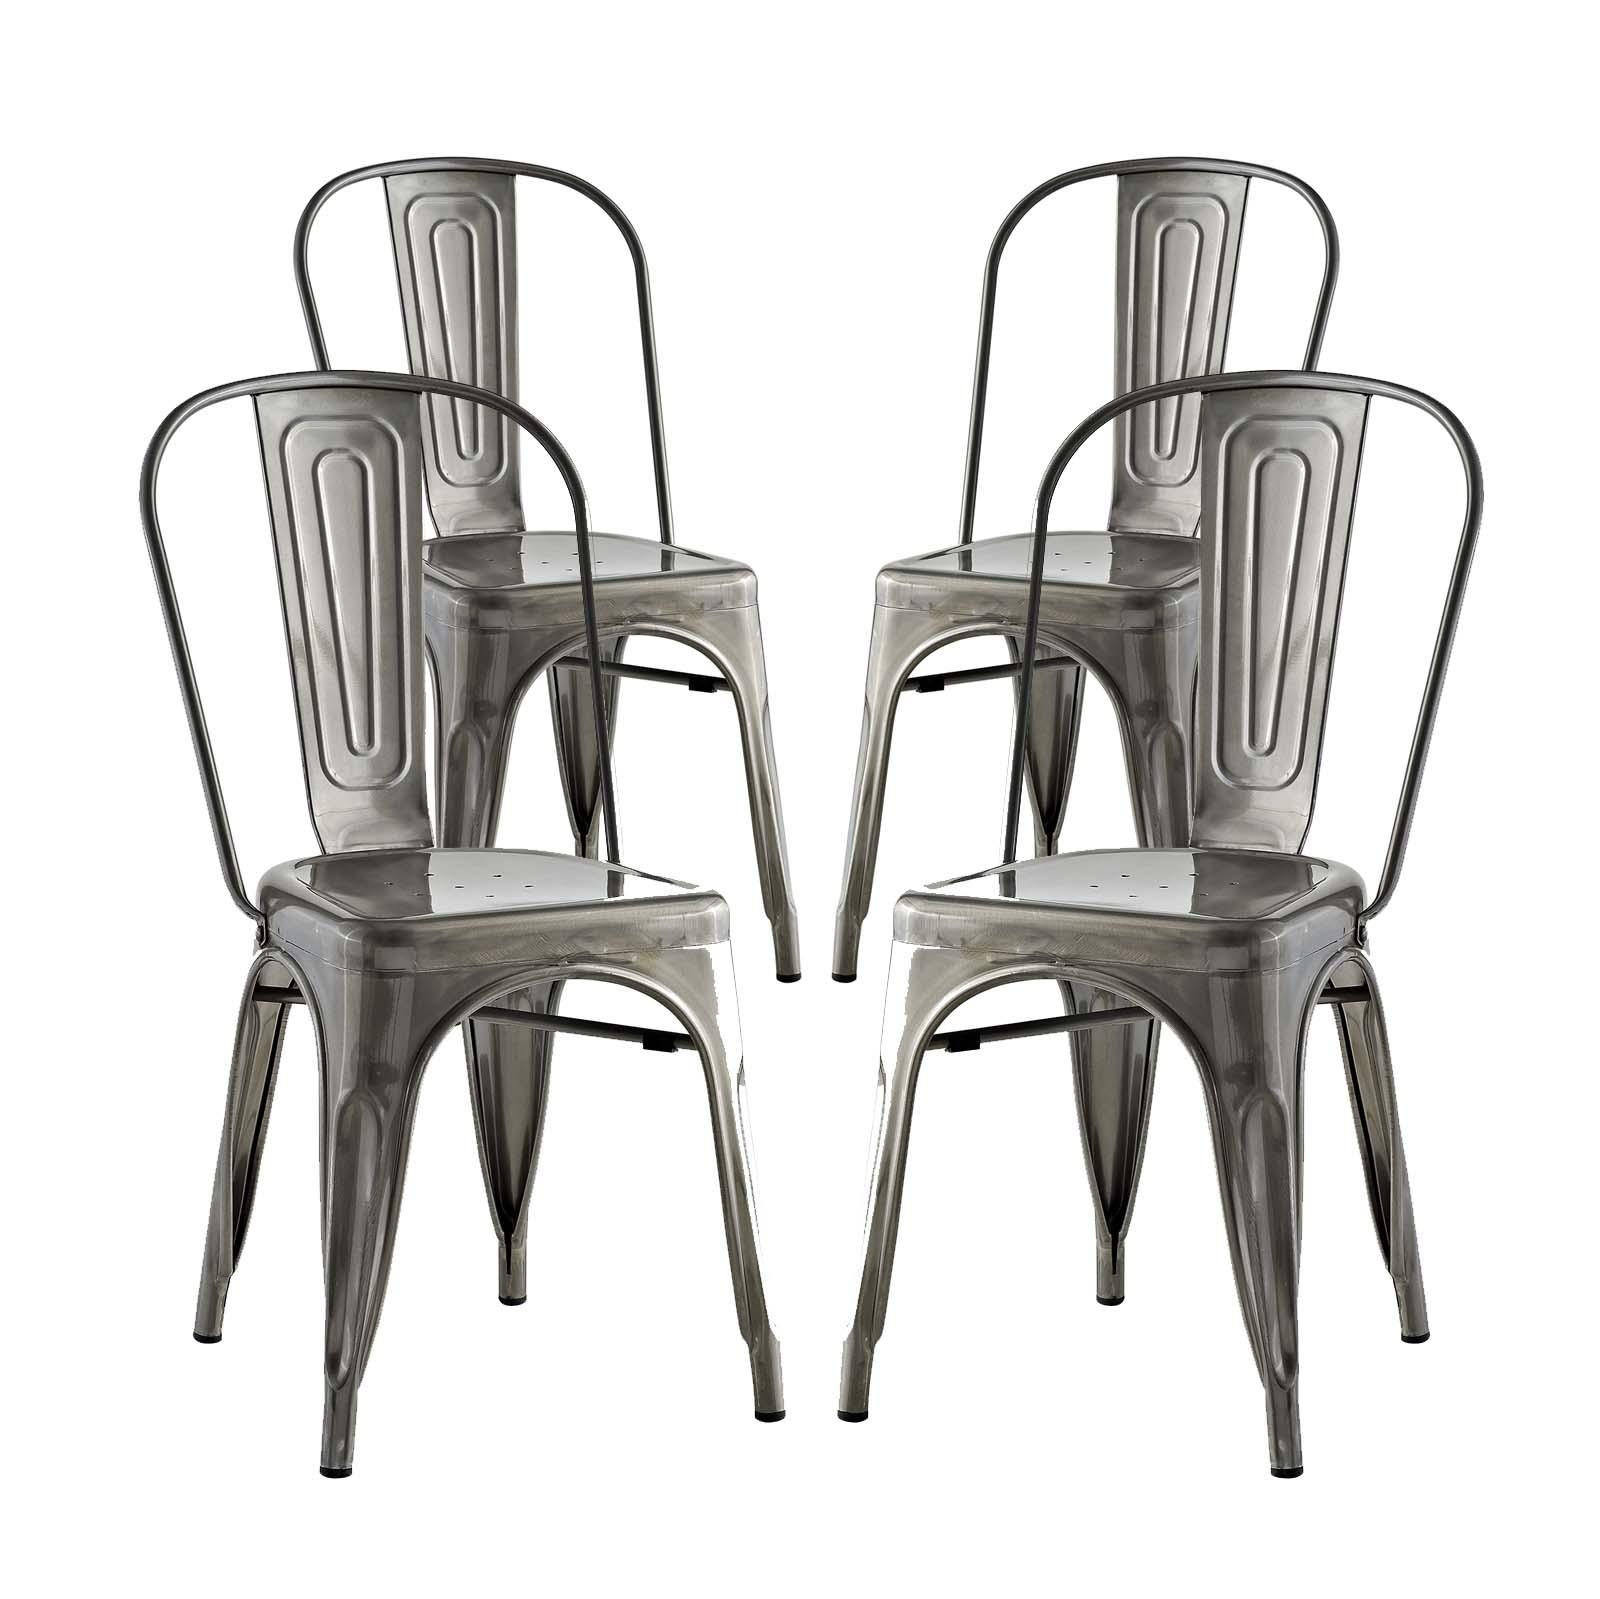 Promenade Dining Side Chair Set of 4 in Gunmetal